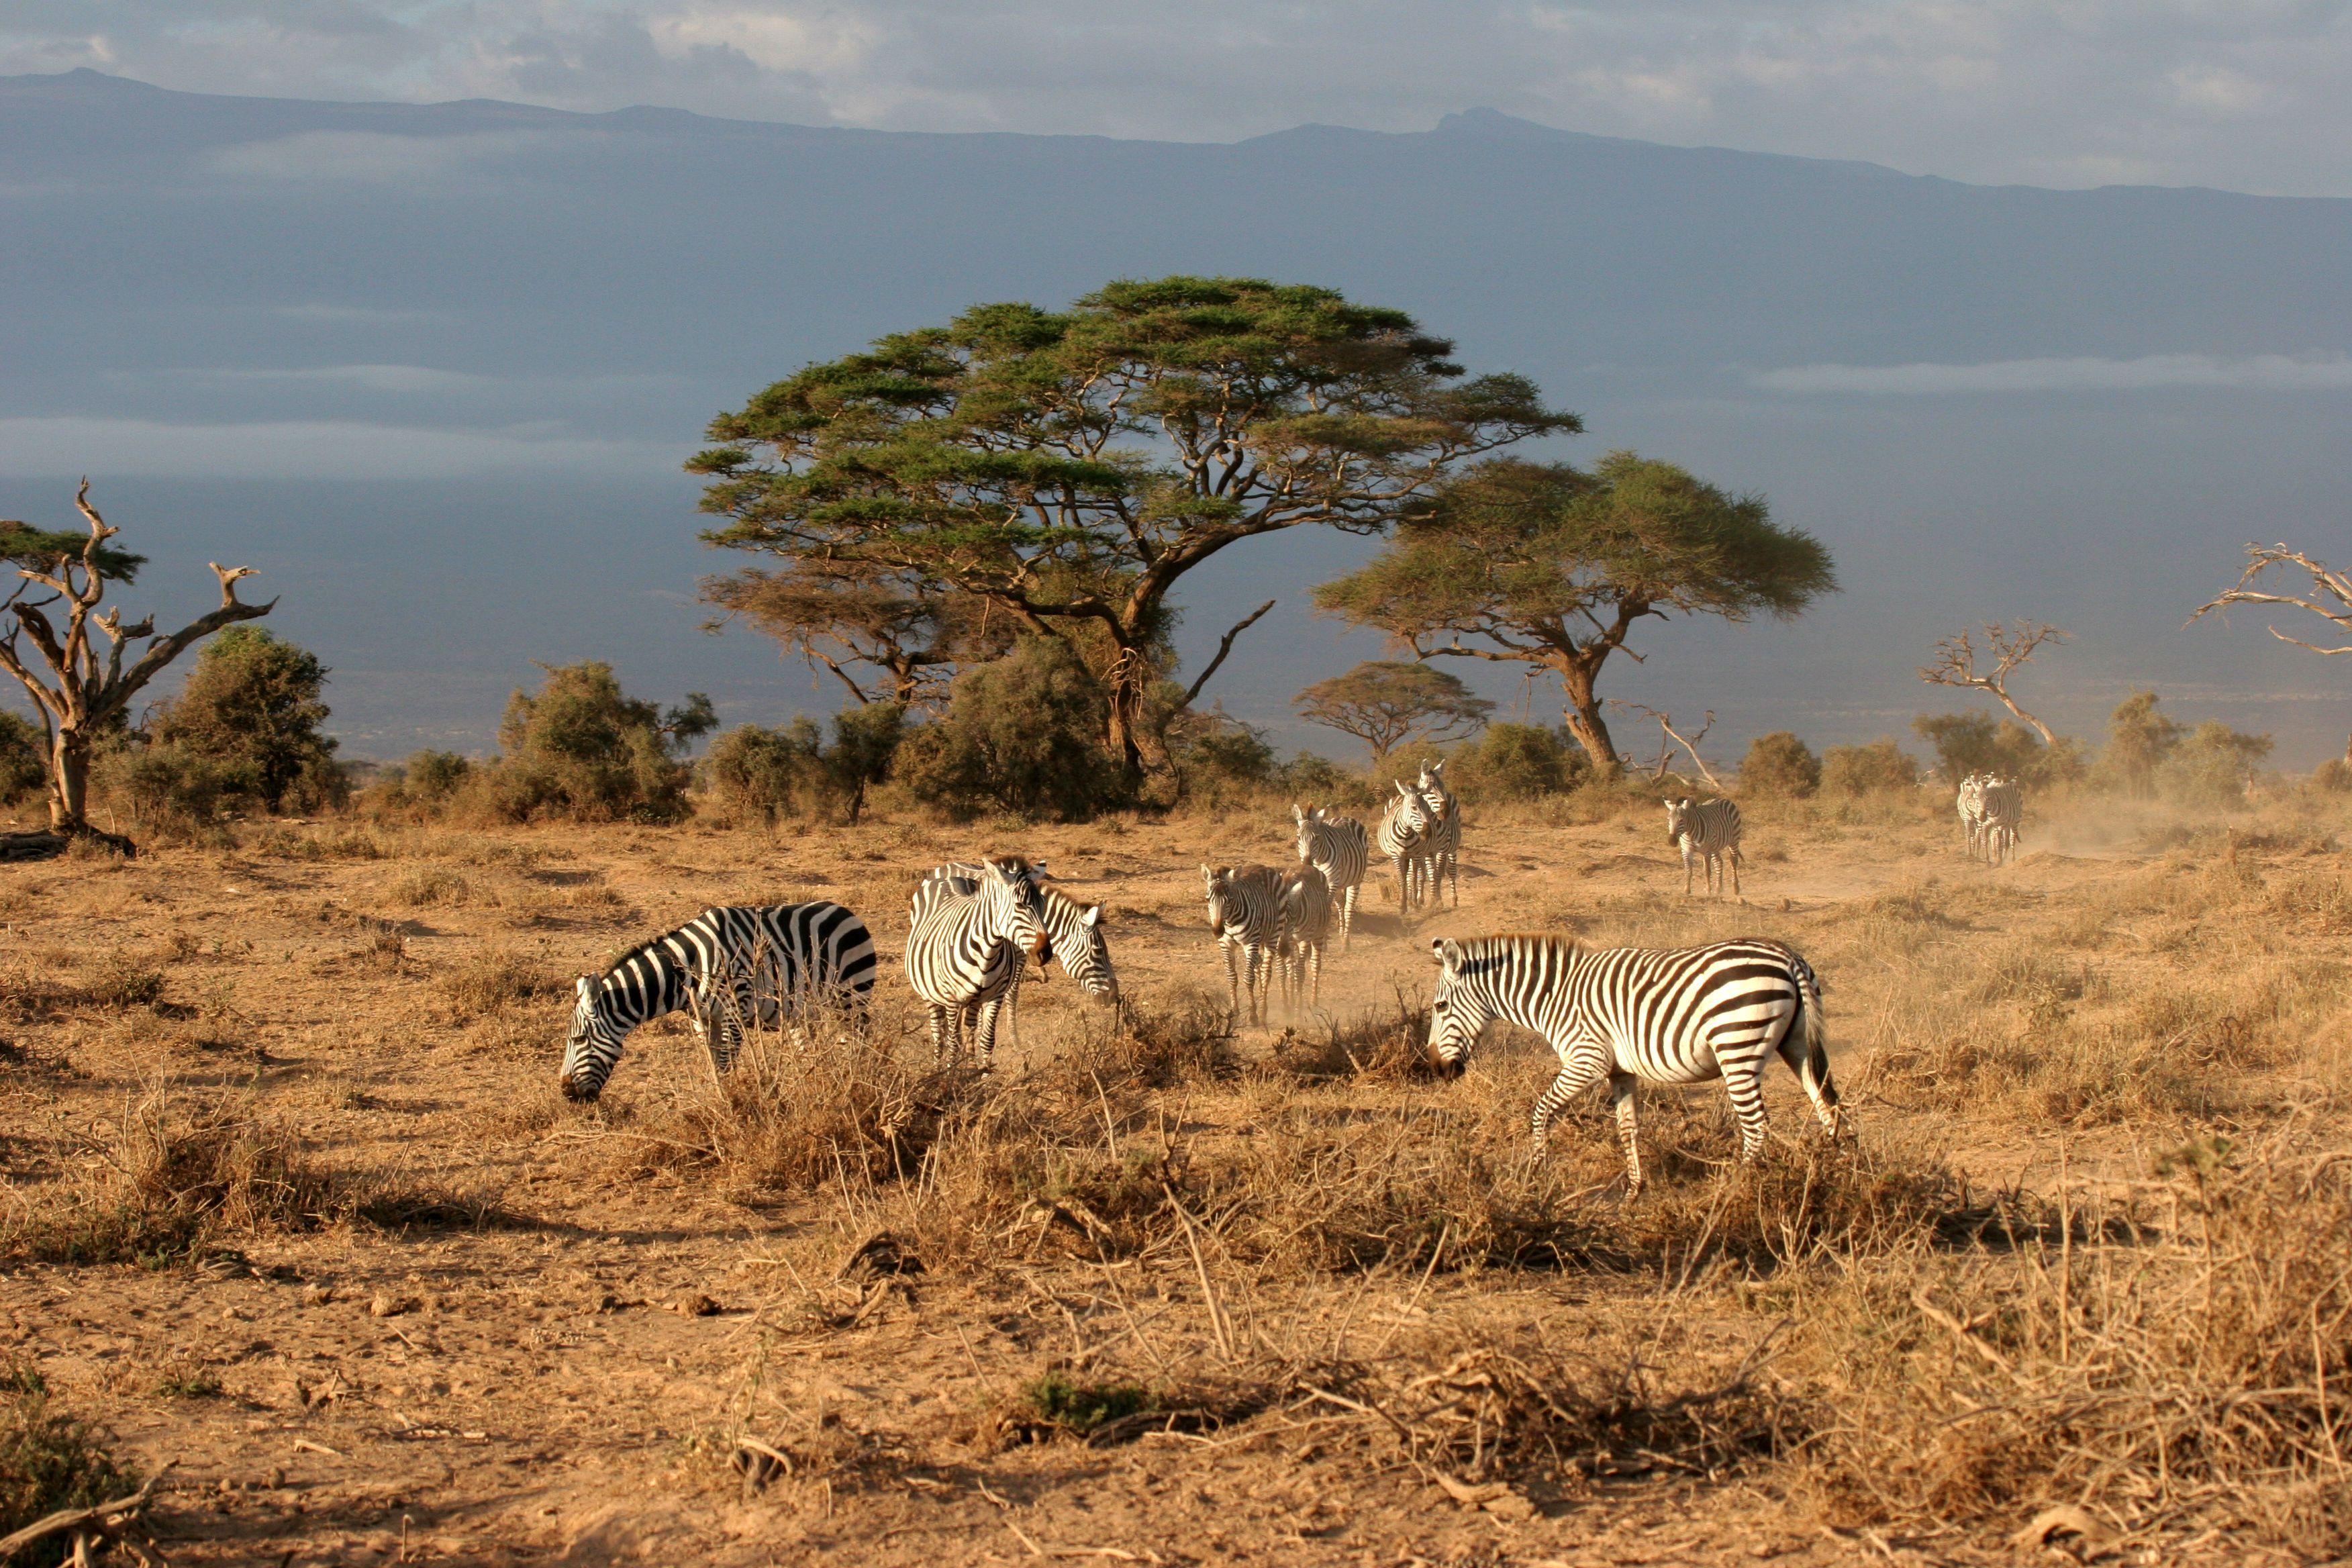 Savane sauter du coq l 39 ne pinterest savane - Dessin paysage africain ...